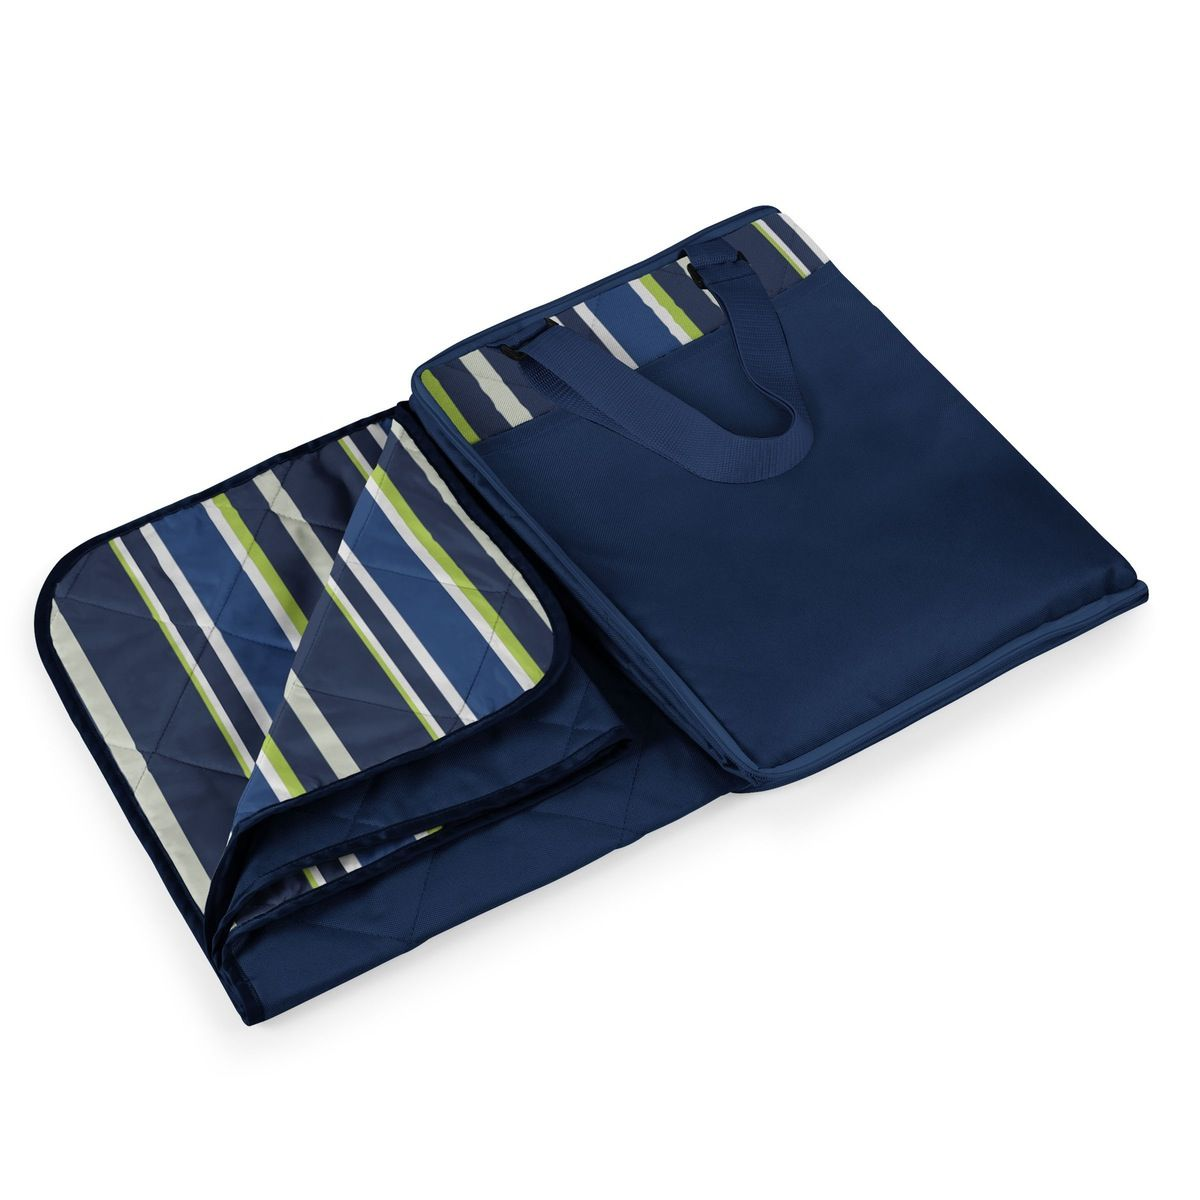 Picnic Time Vista Blanket XL - Set of 2 – Modish Store.